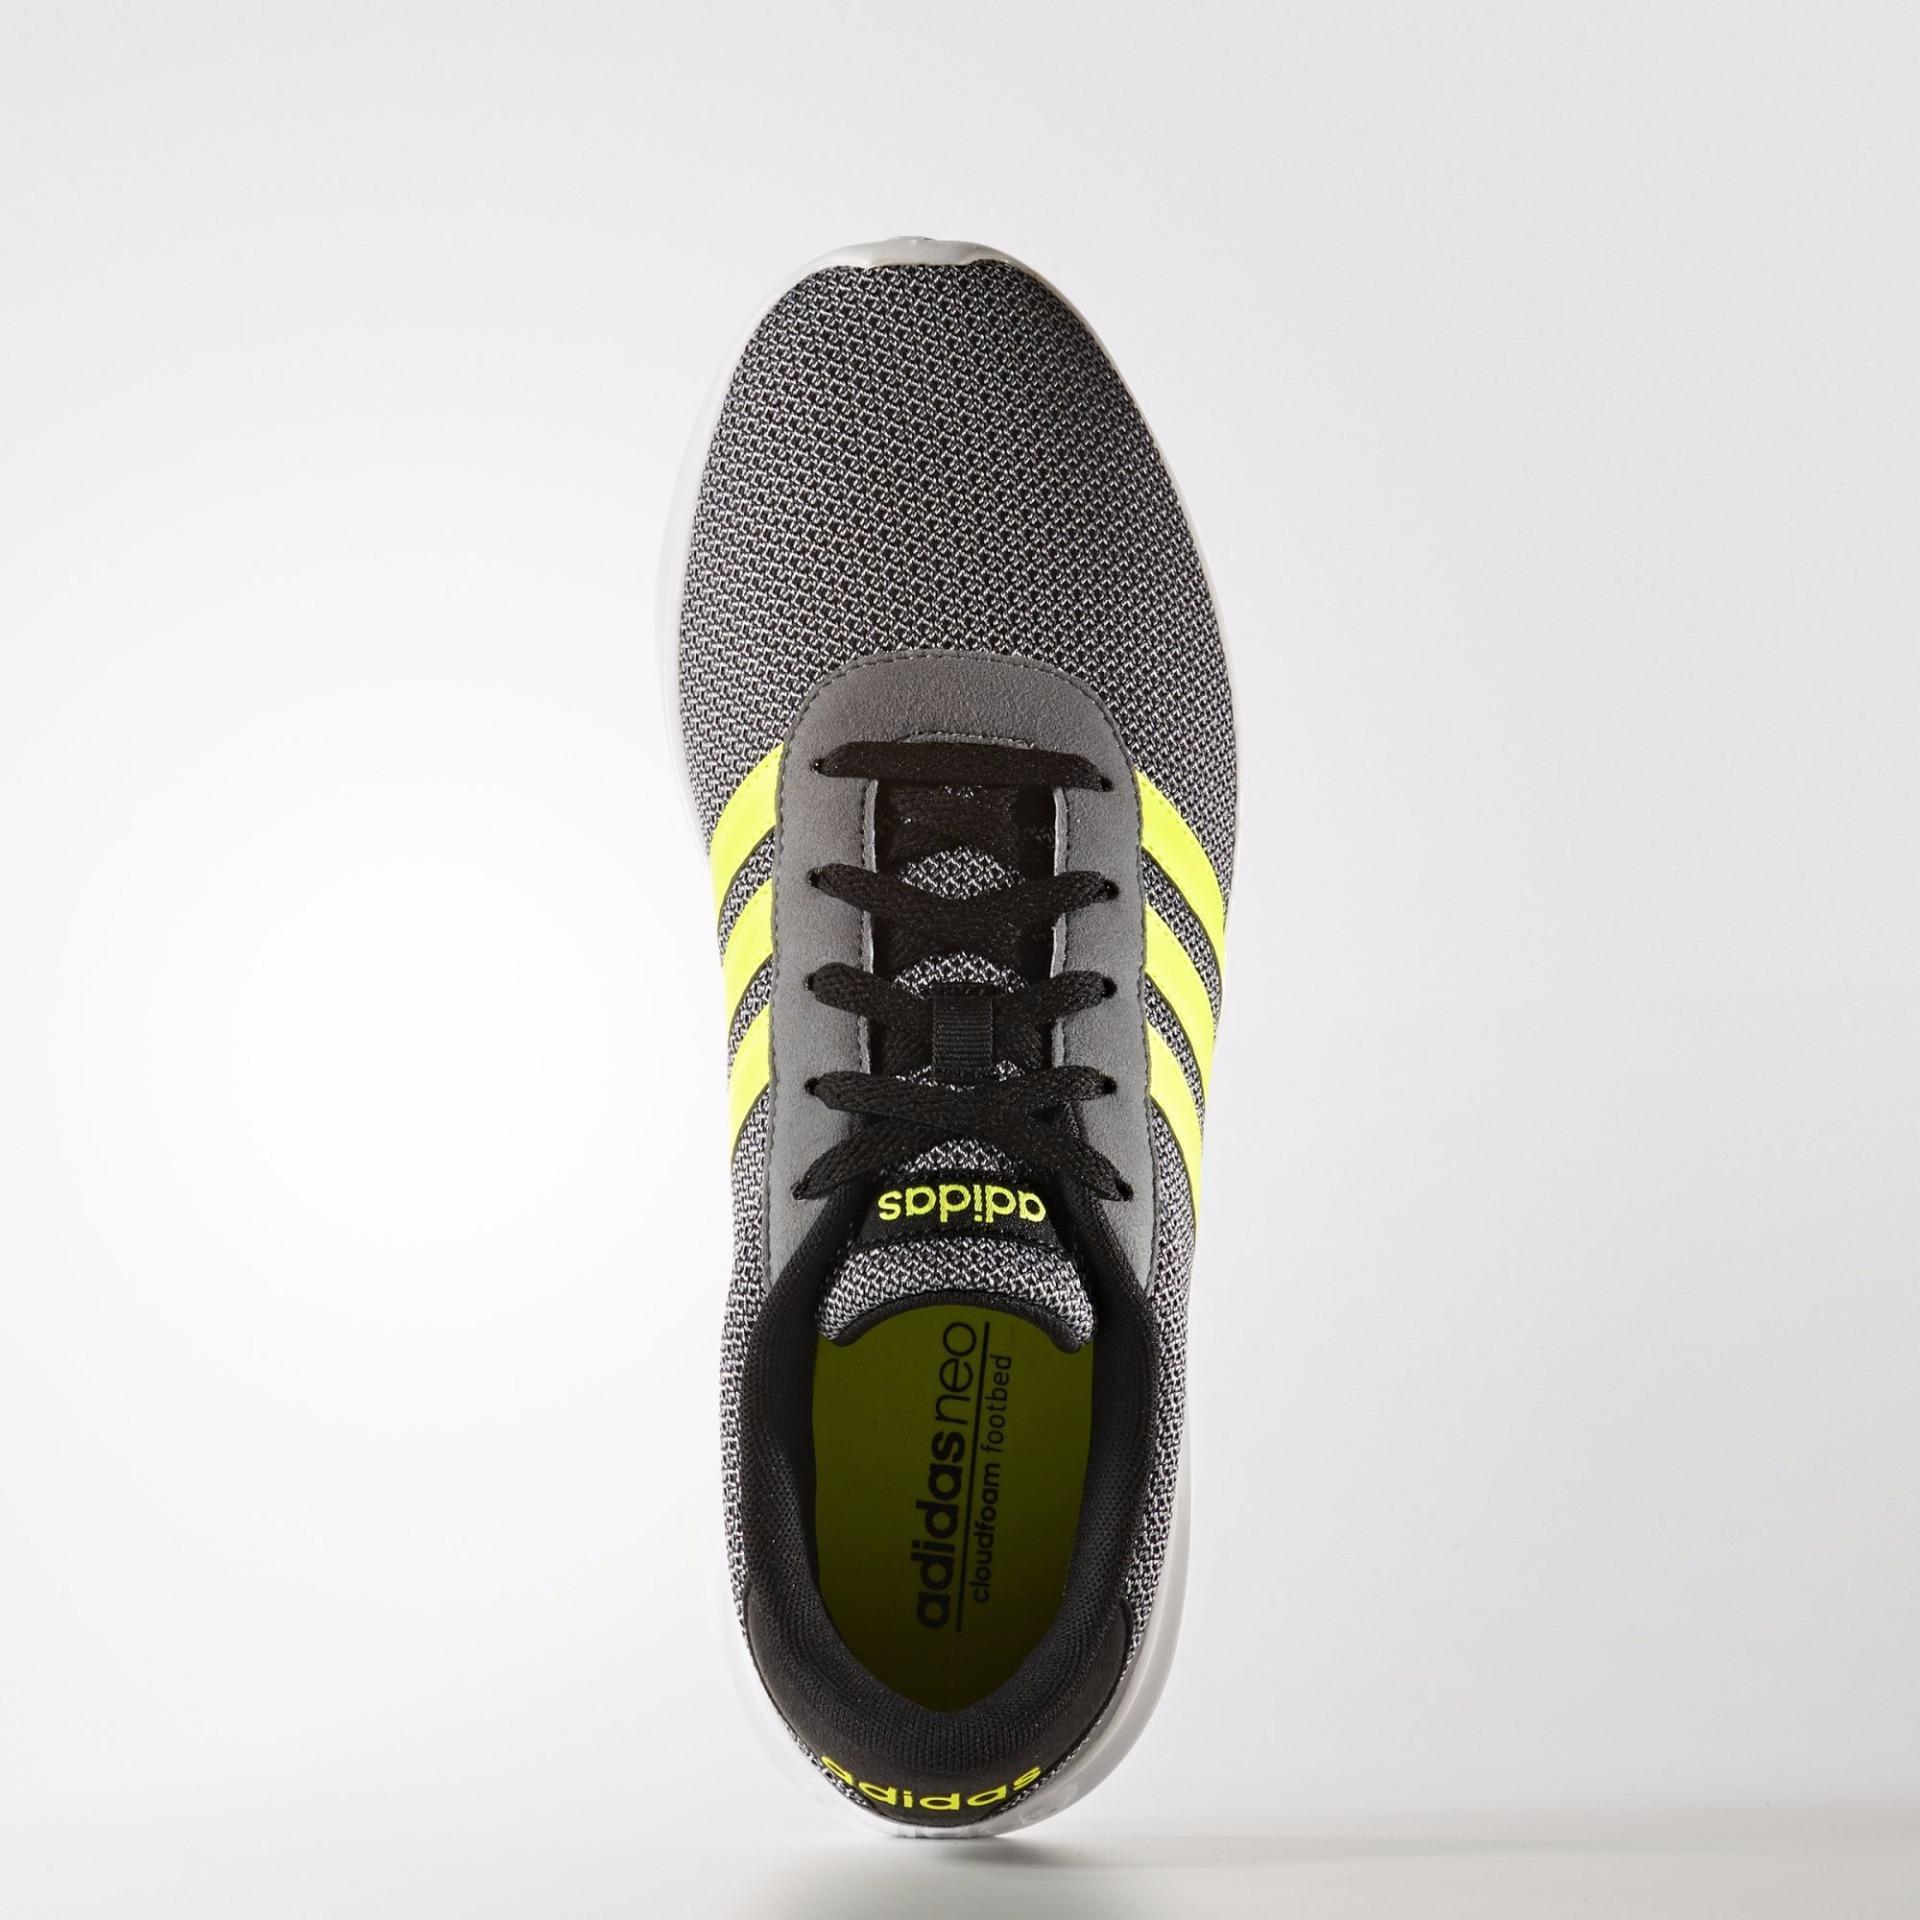 2a7c978808b81 ... sweden giày th thao nam adidas neo lite racer aw3871 cbd1f f983a